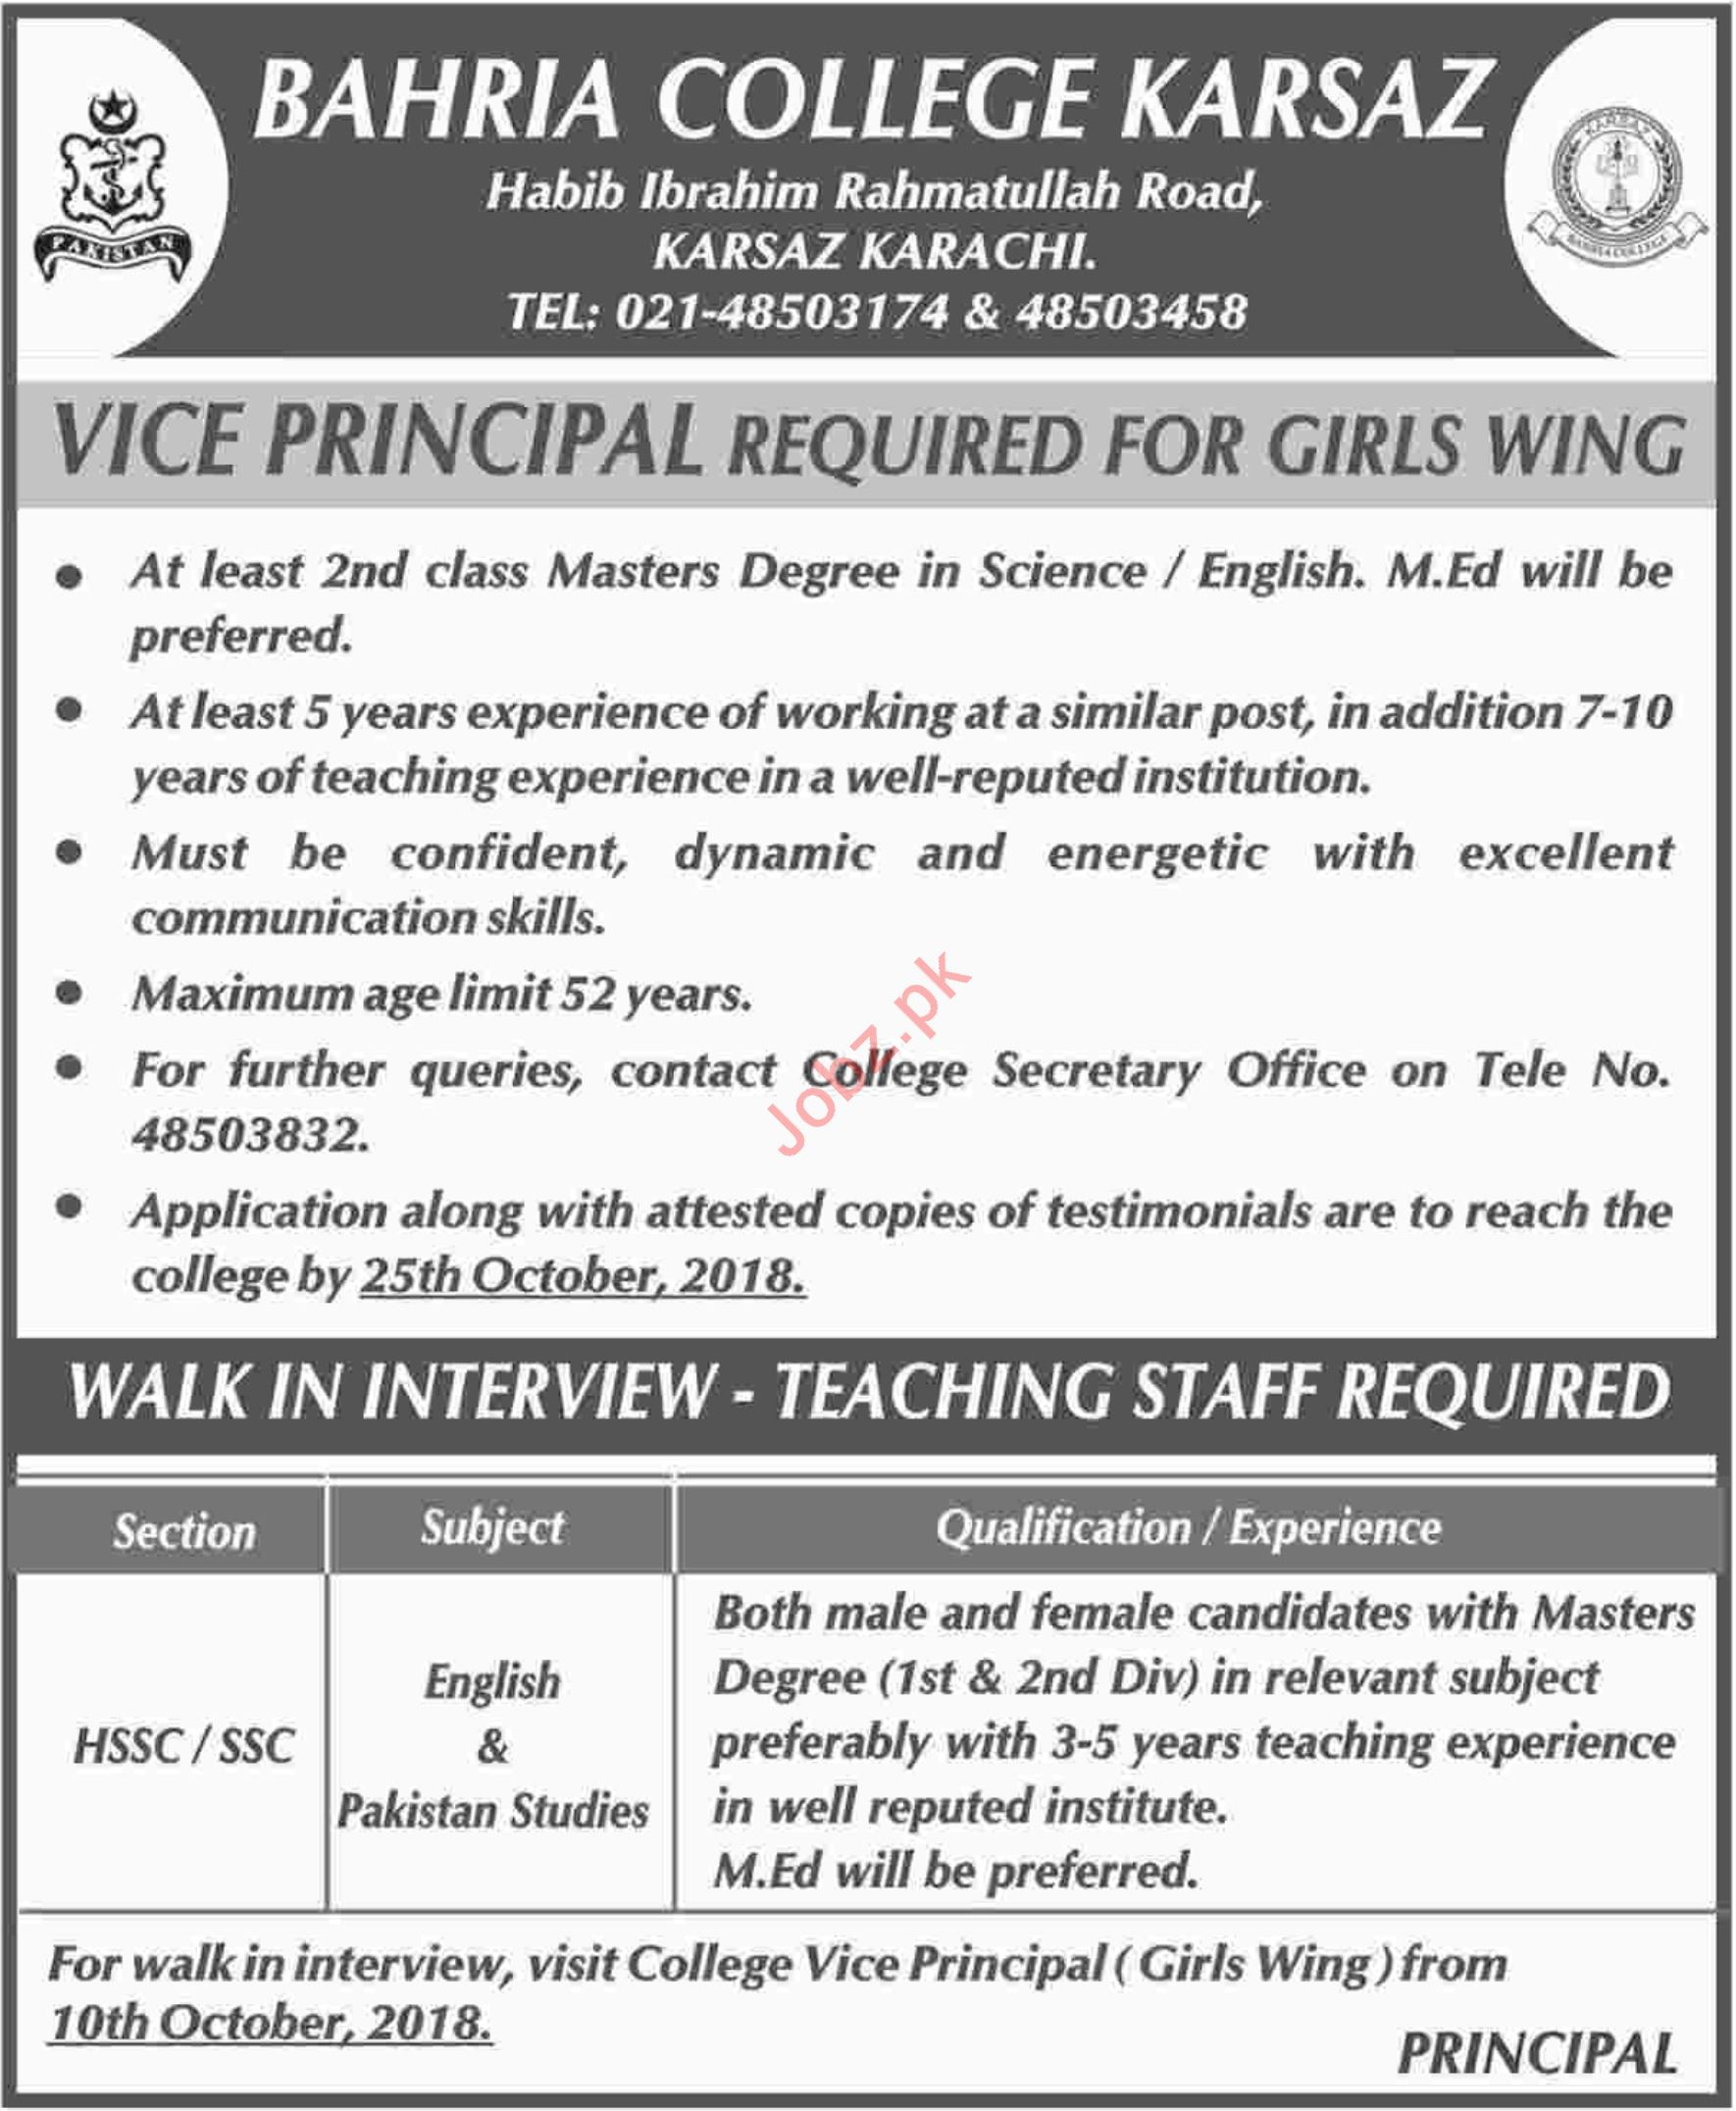 Bahria College Karsaz Karachi Jobs 2018 for Vice Principal